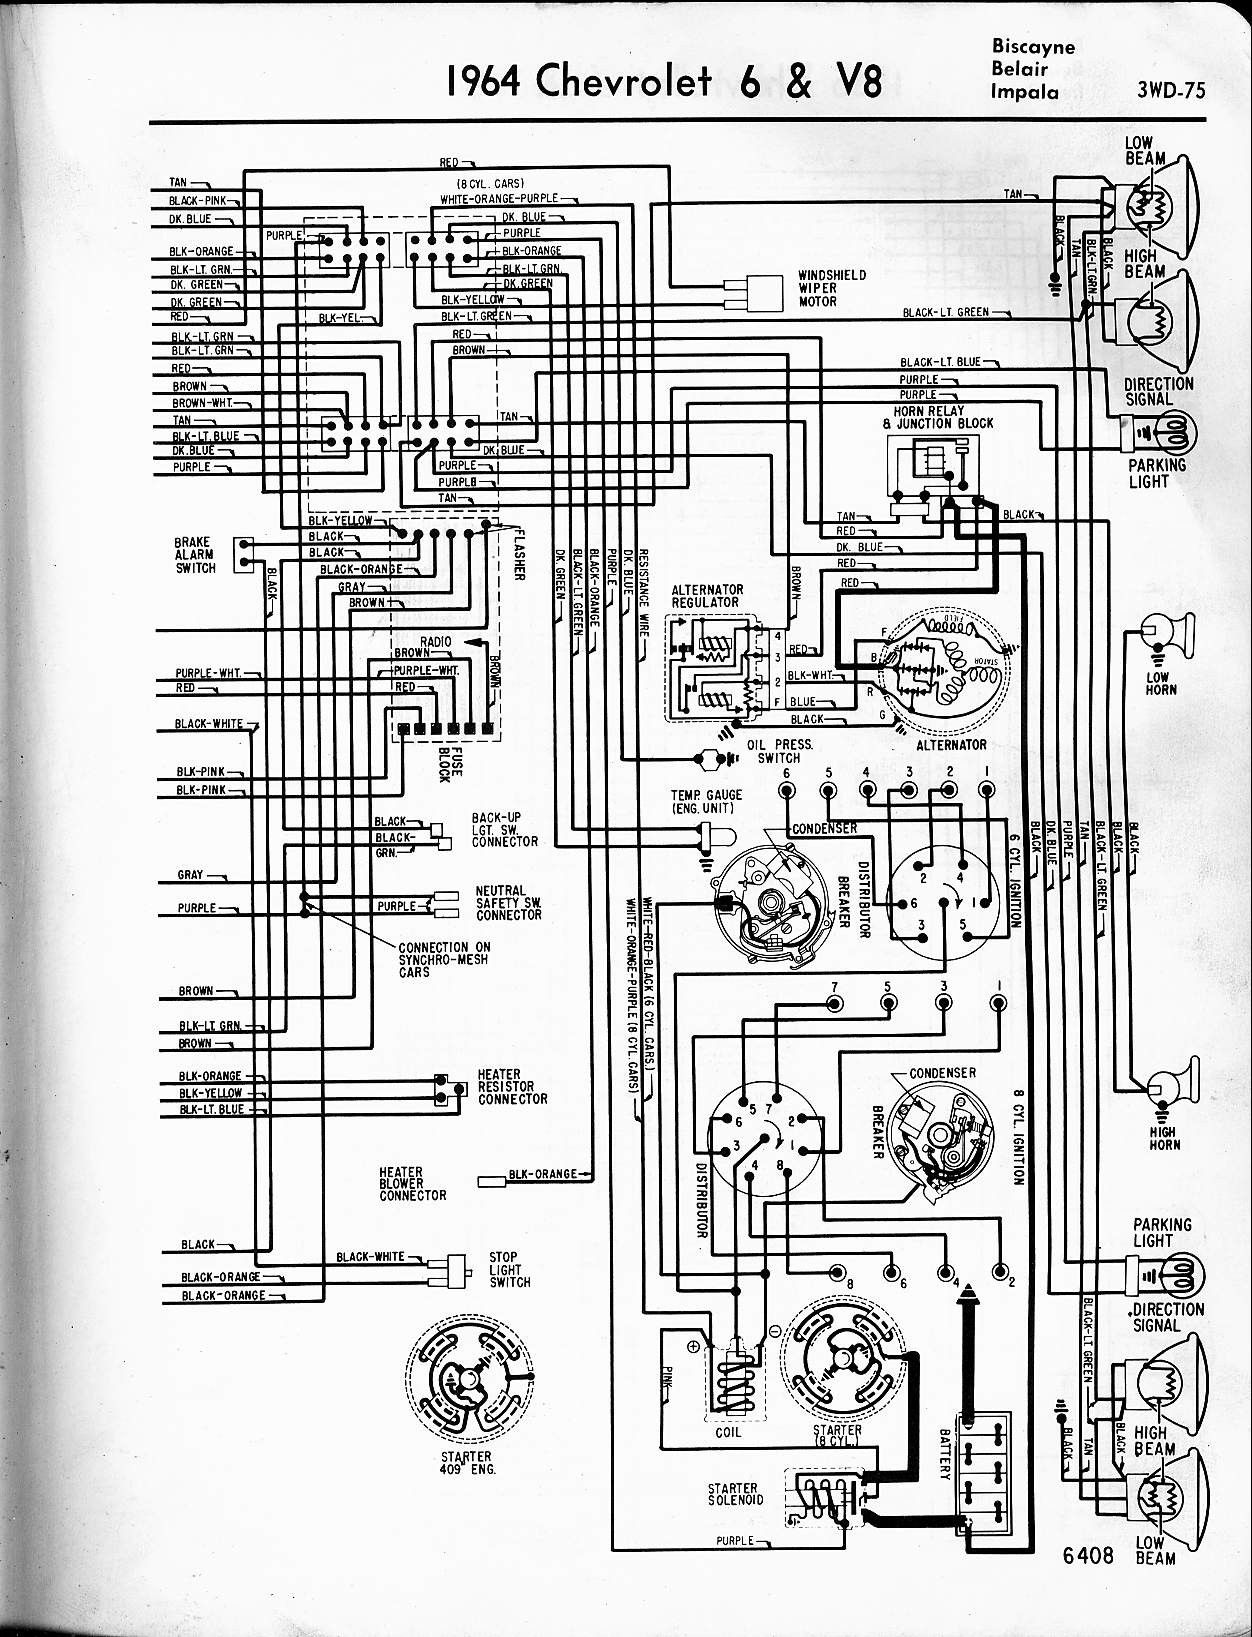 2002 Impala Wiring Diagram In 2021 Chevy Impala Engine Diagram Impala